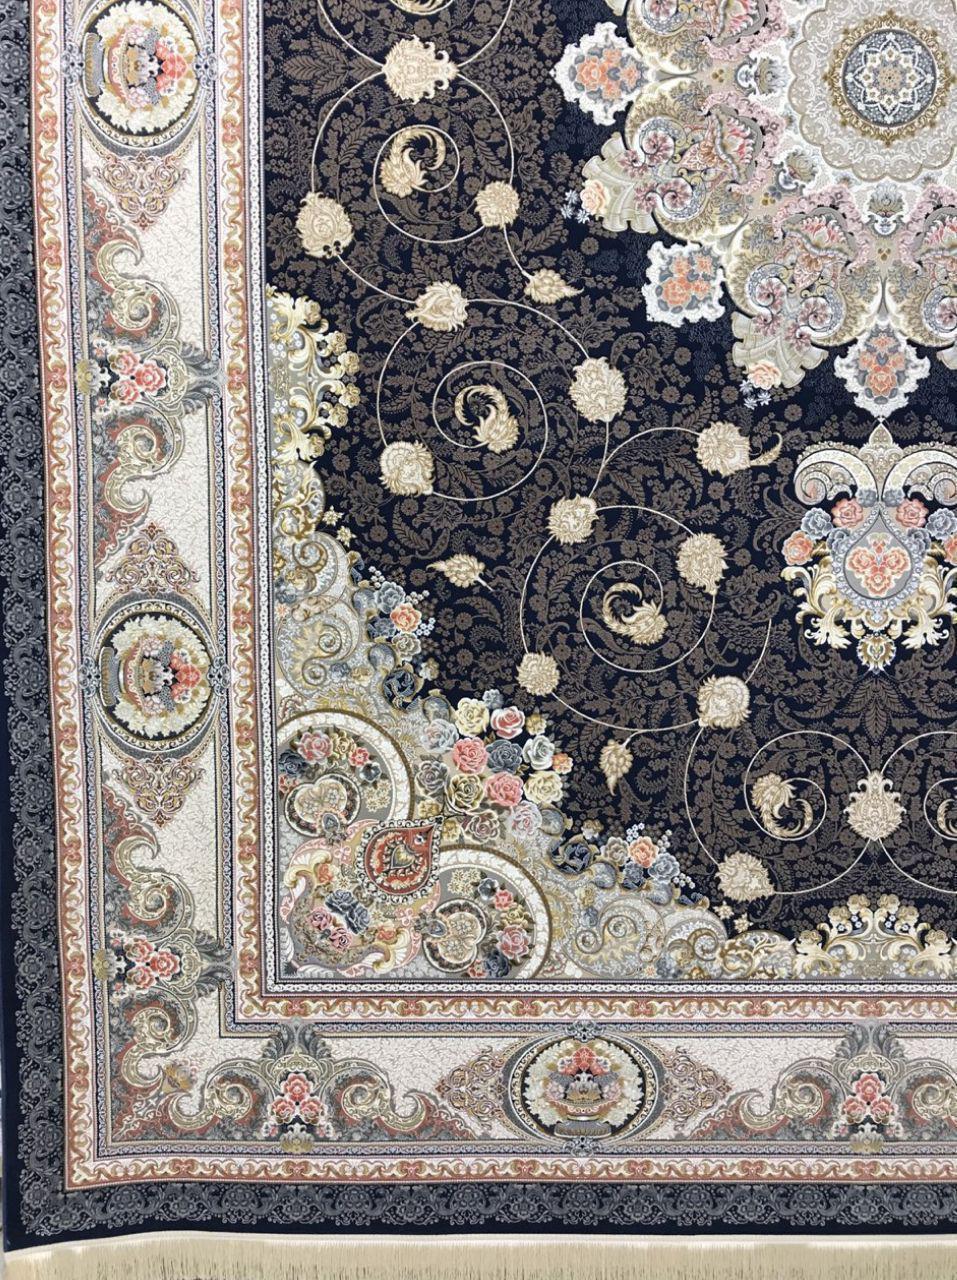 فرش زمینه سرمه ای 1500 شانه